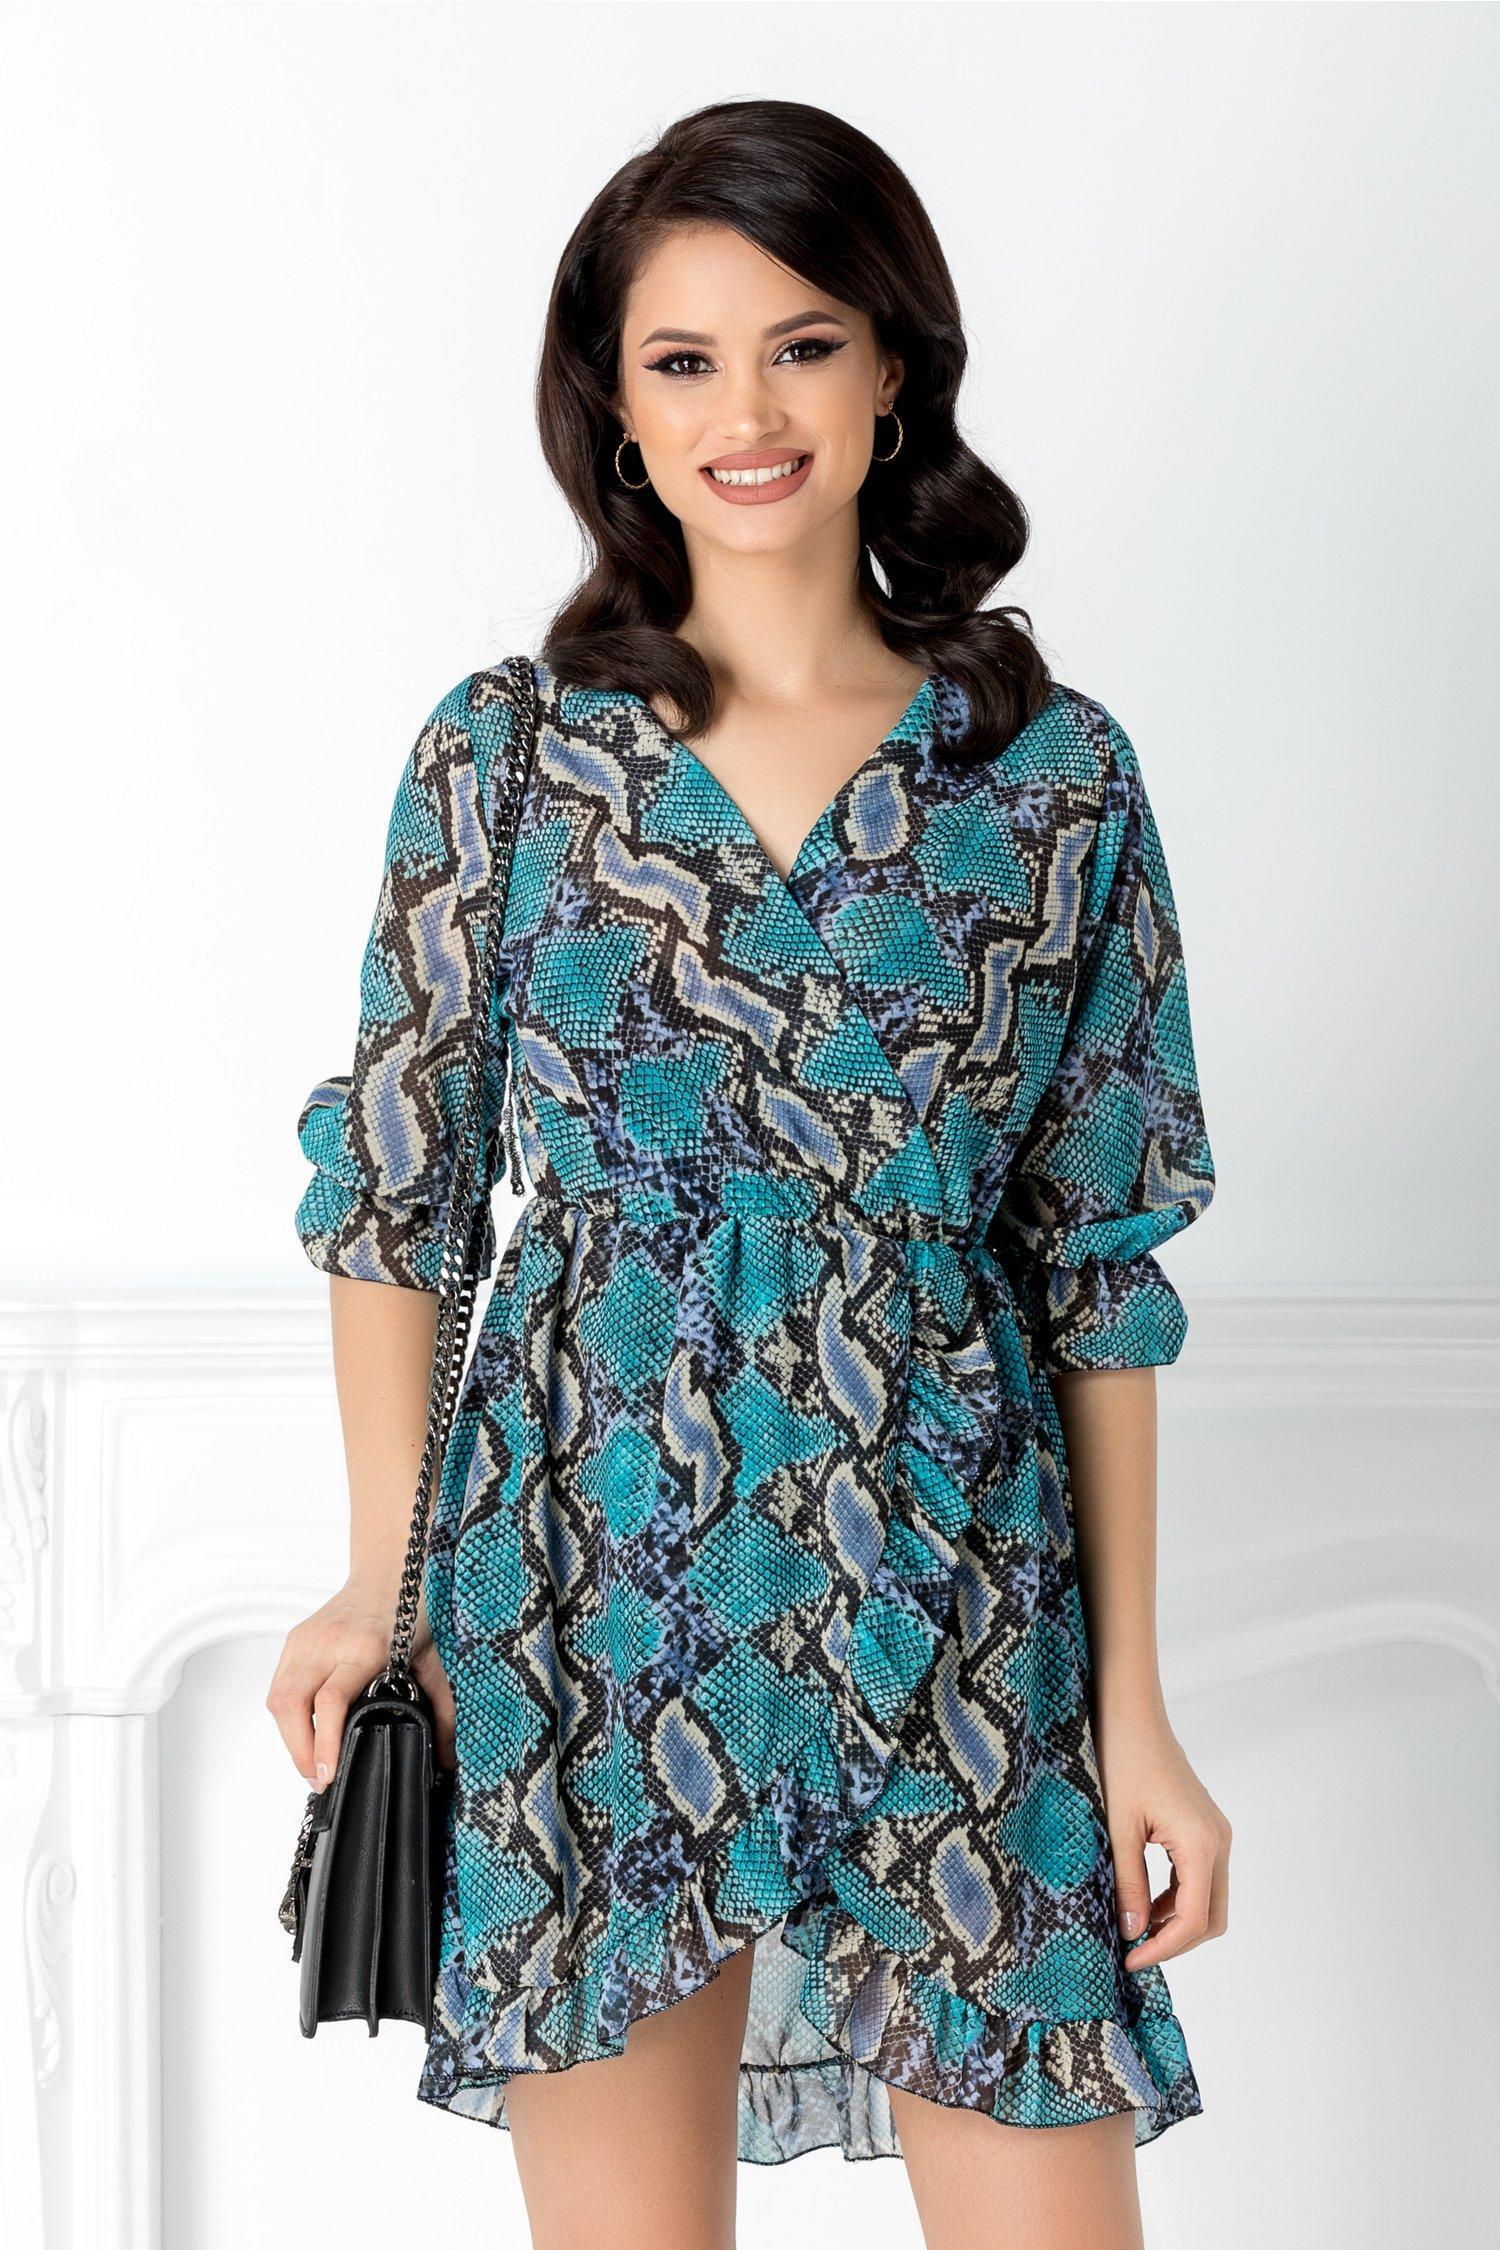 Rochie petrecuta cu print piele de sarpe albastru